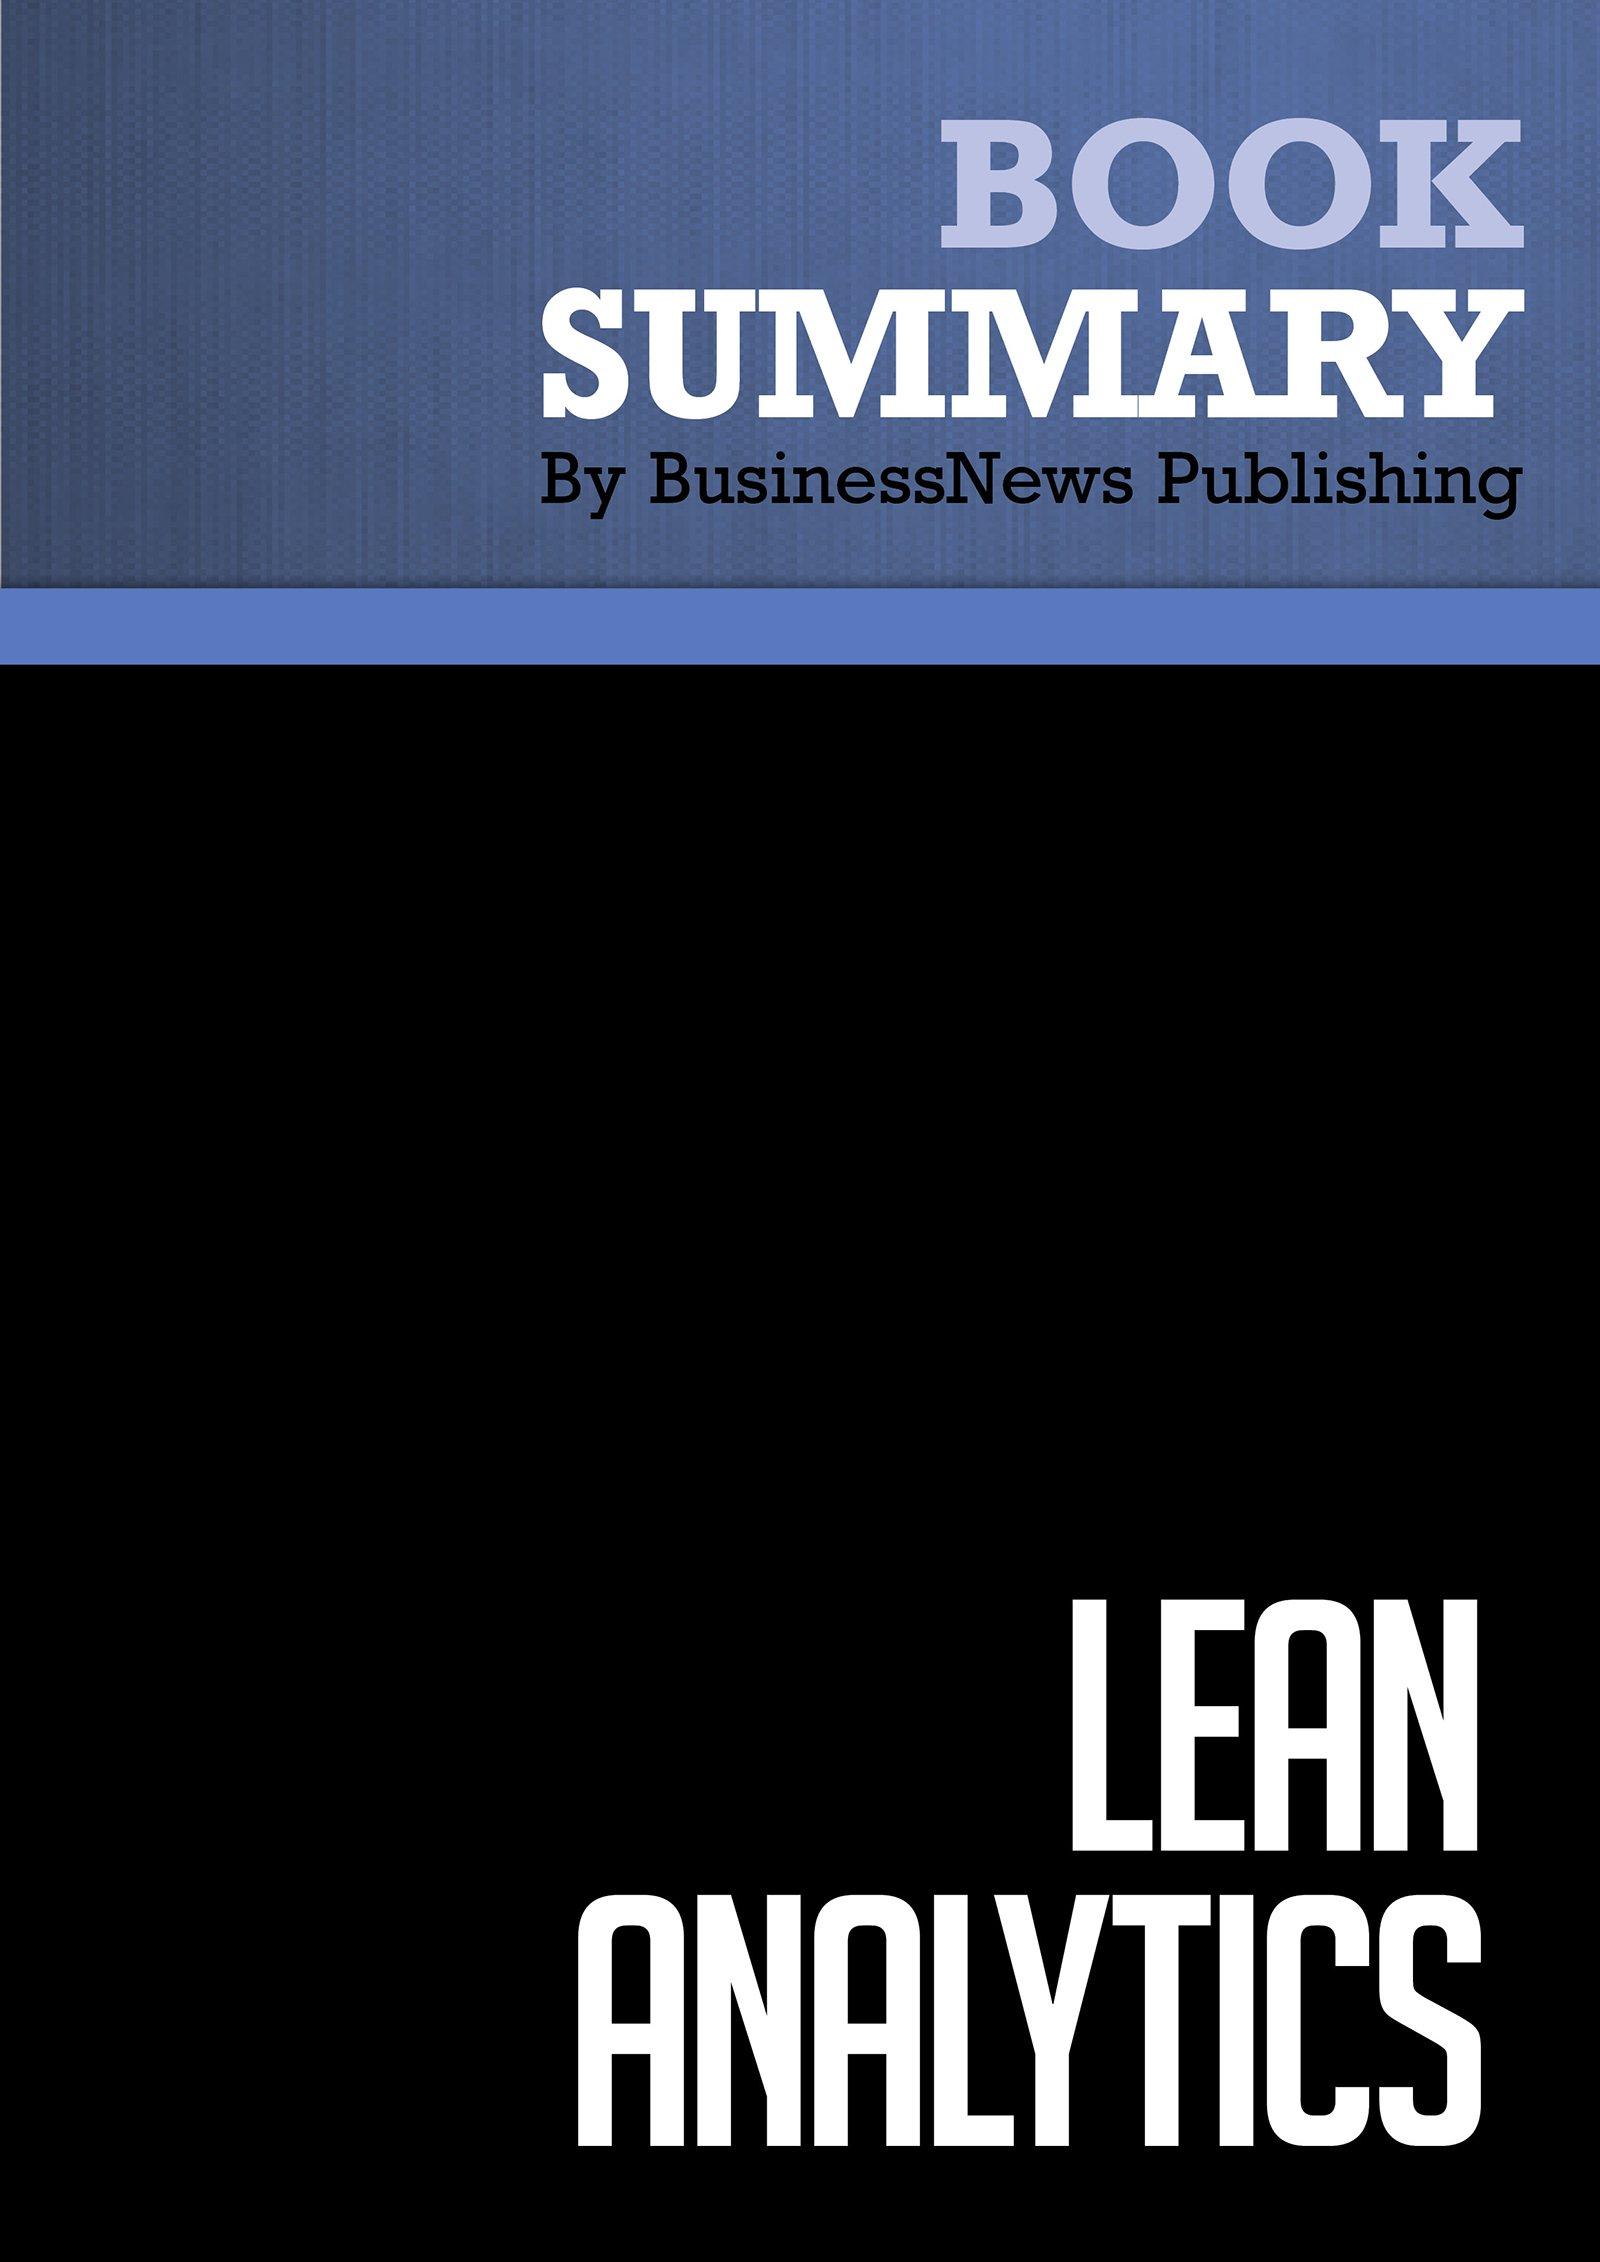 Lean Analytics Summary Summary Lean Analytics